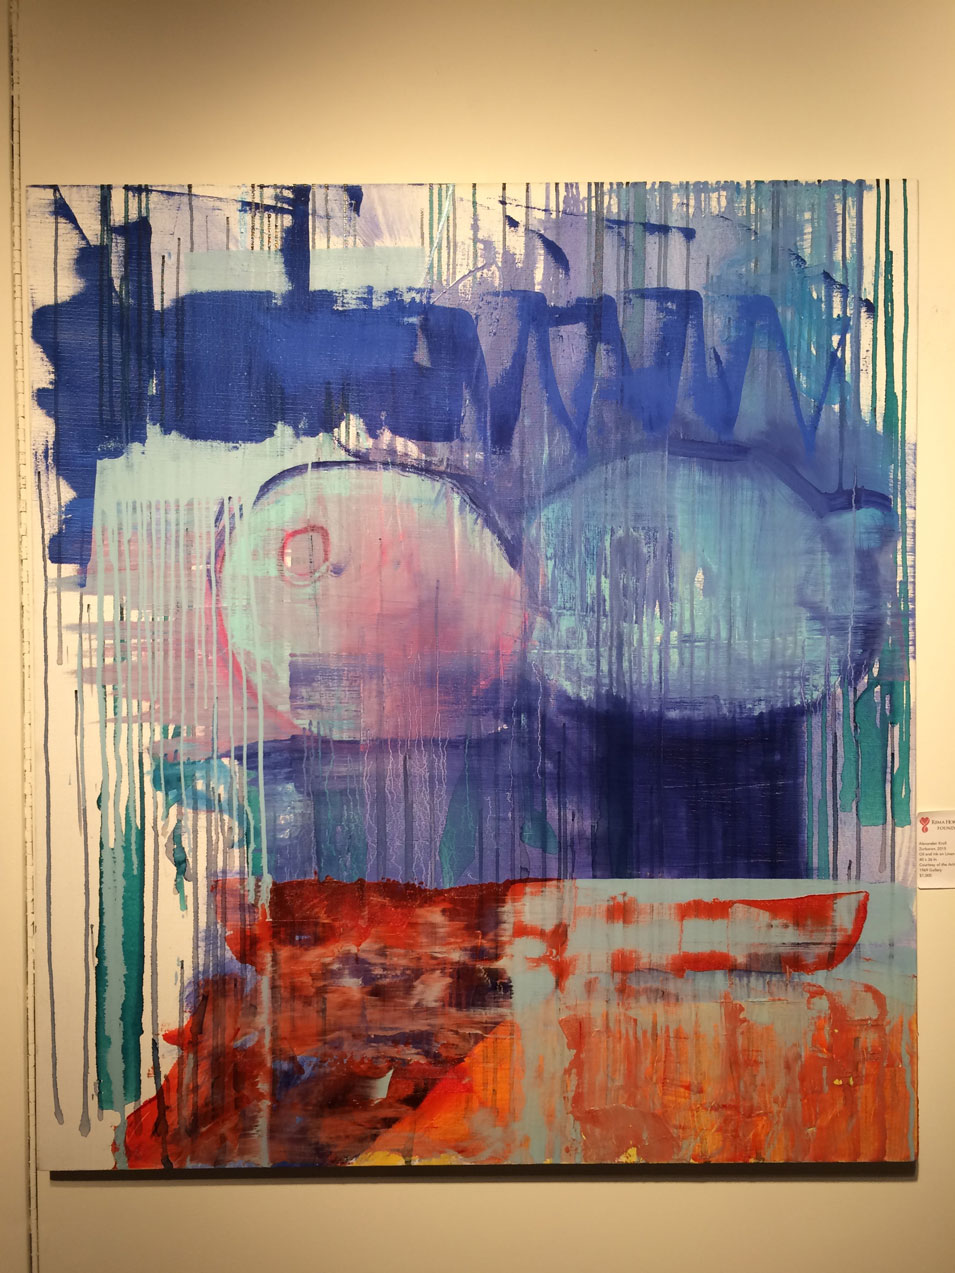 Alexander Kroll,  Zurbaran , 2015, oil and ink on linen, Rema Hort Mann Foundation